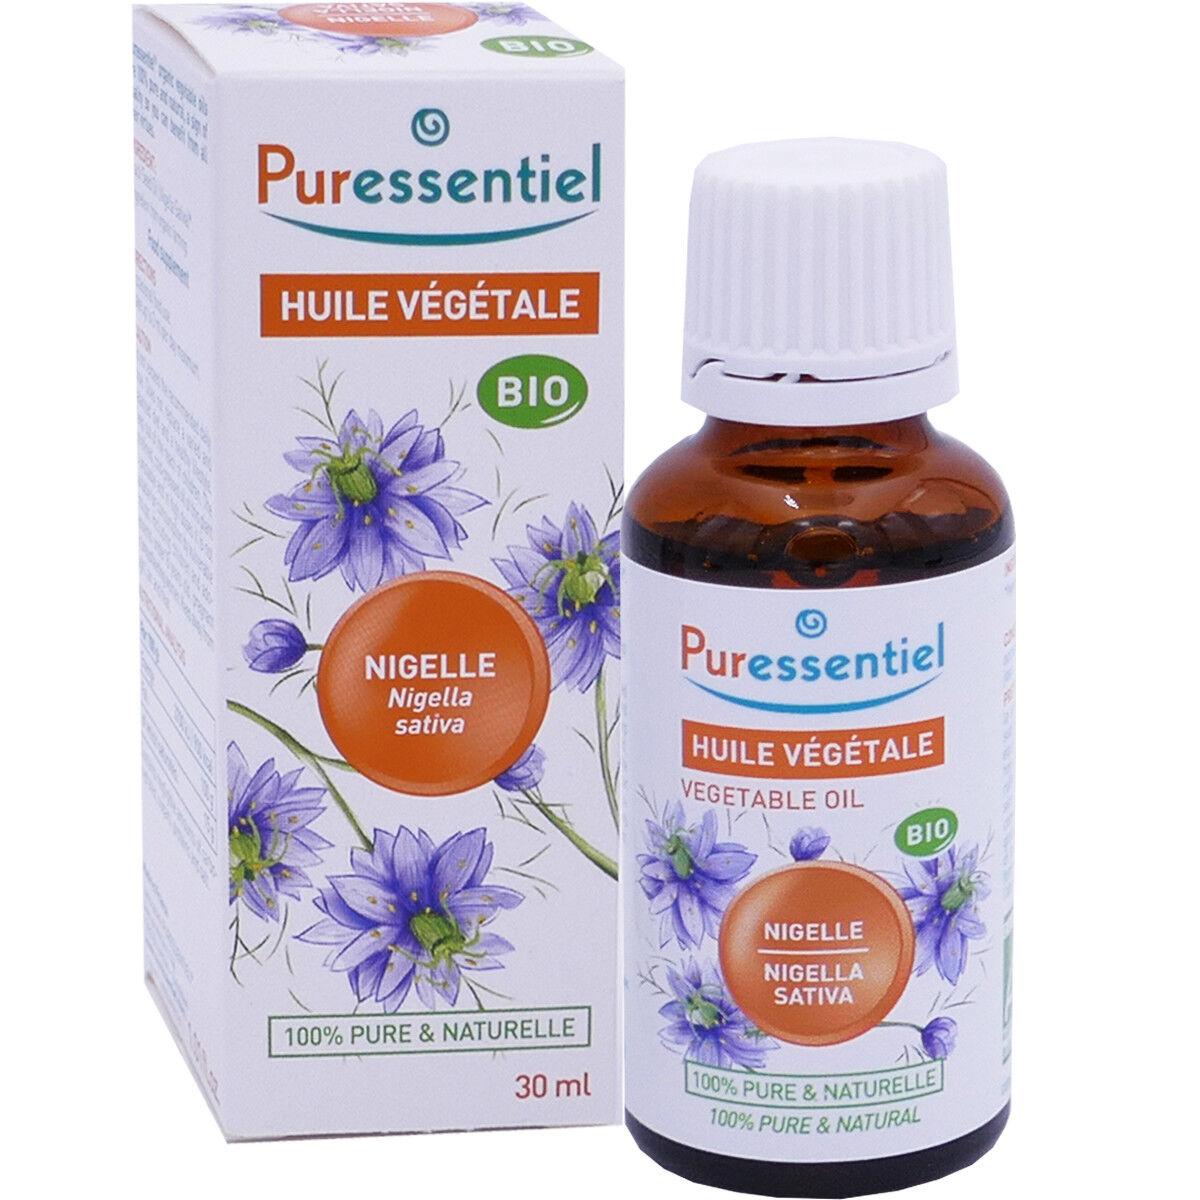 Puressentiel huile vegetale bio nigelle 30 ml